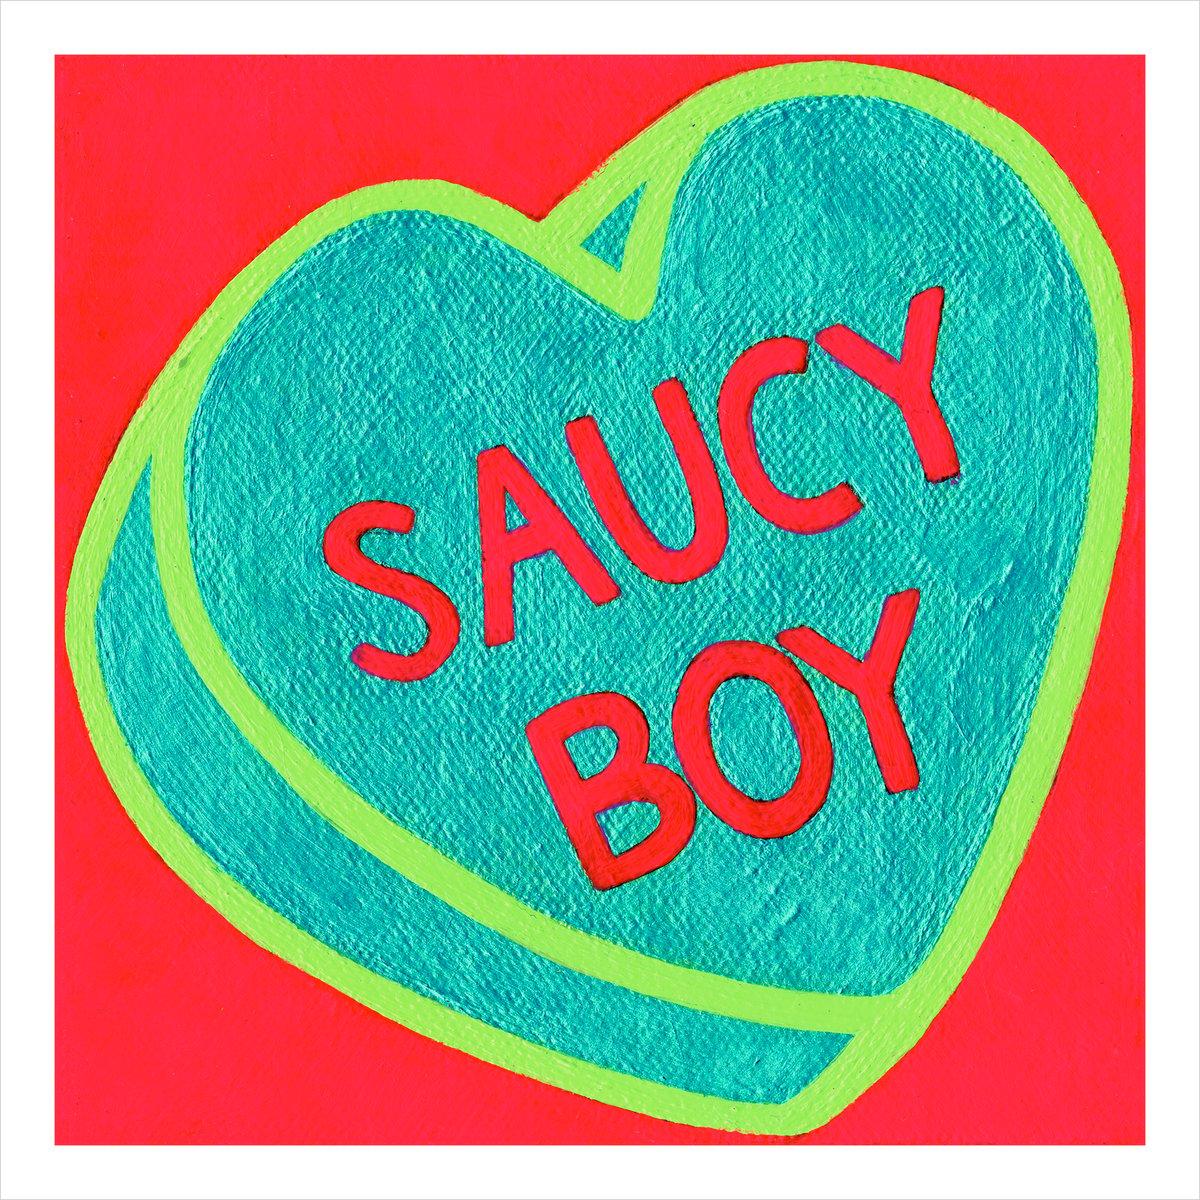 Image of Saucy Boy print